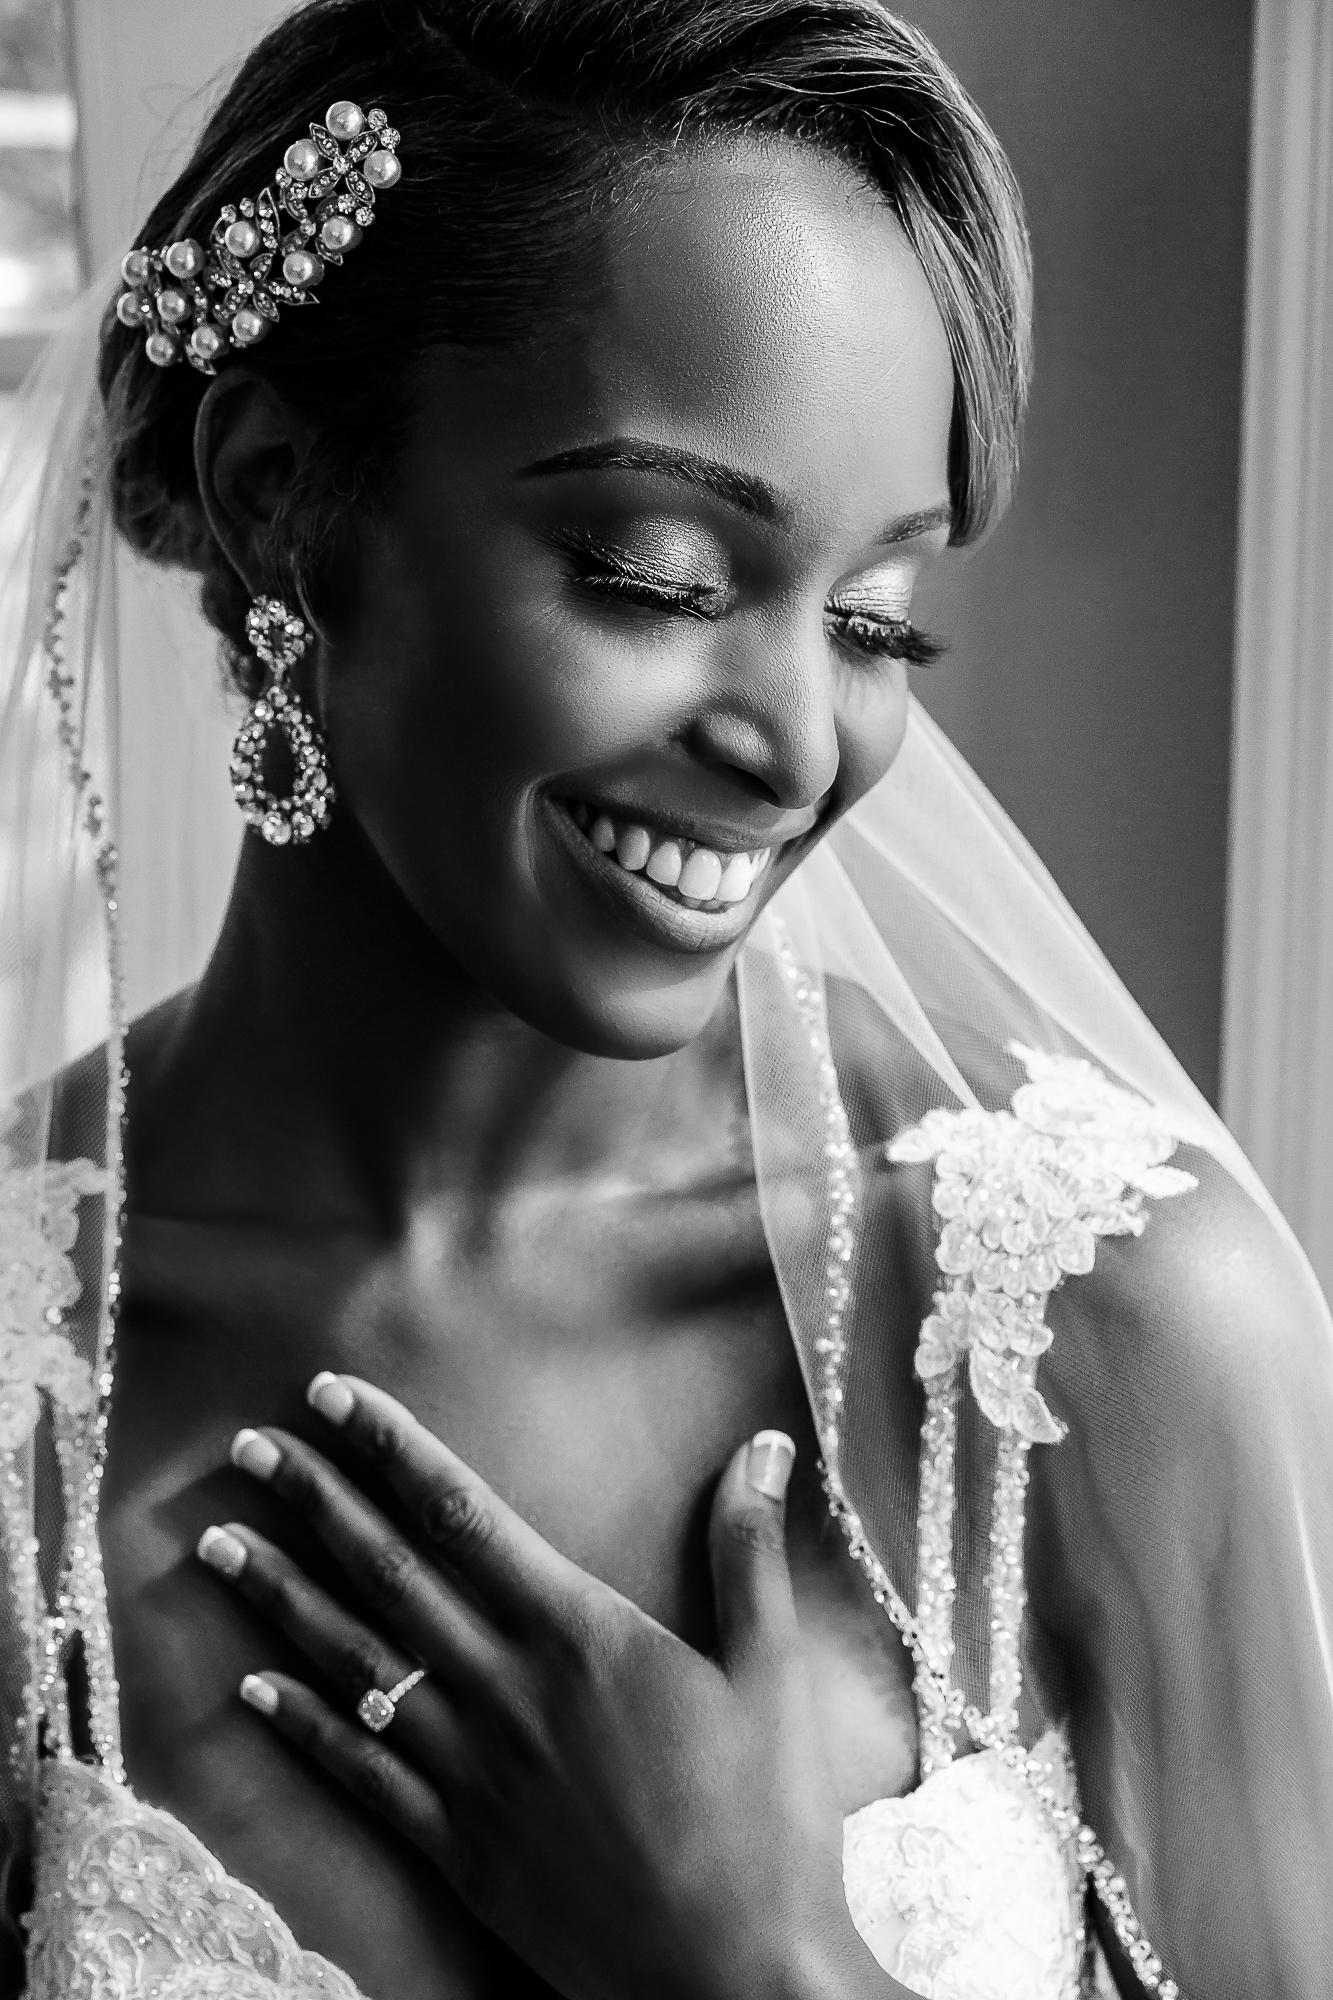 portrait-of-bride-wearing-beaded-veil-and-chandelier-earrings-christopher-jason-studios